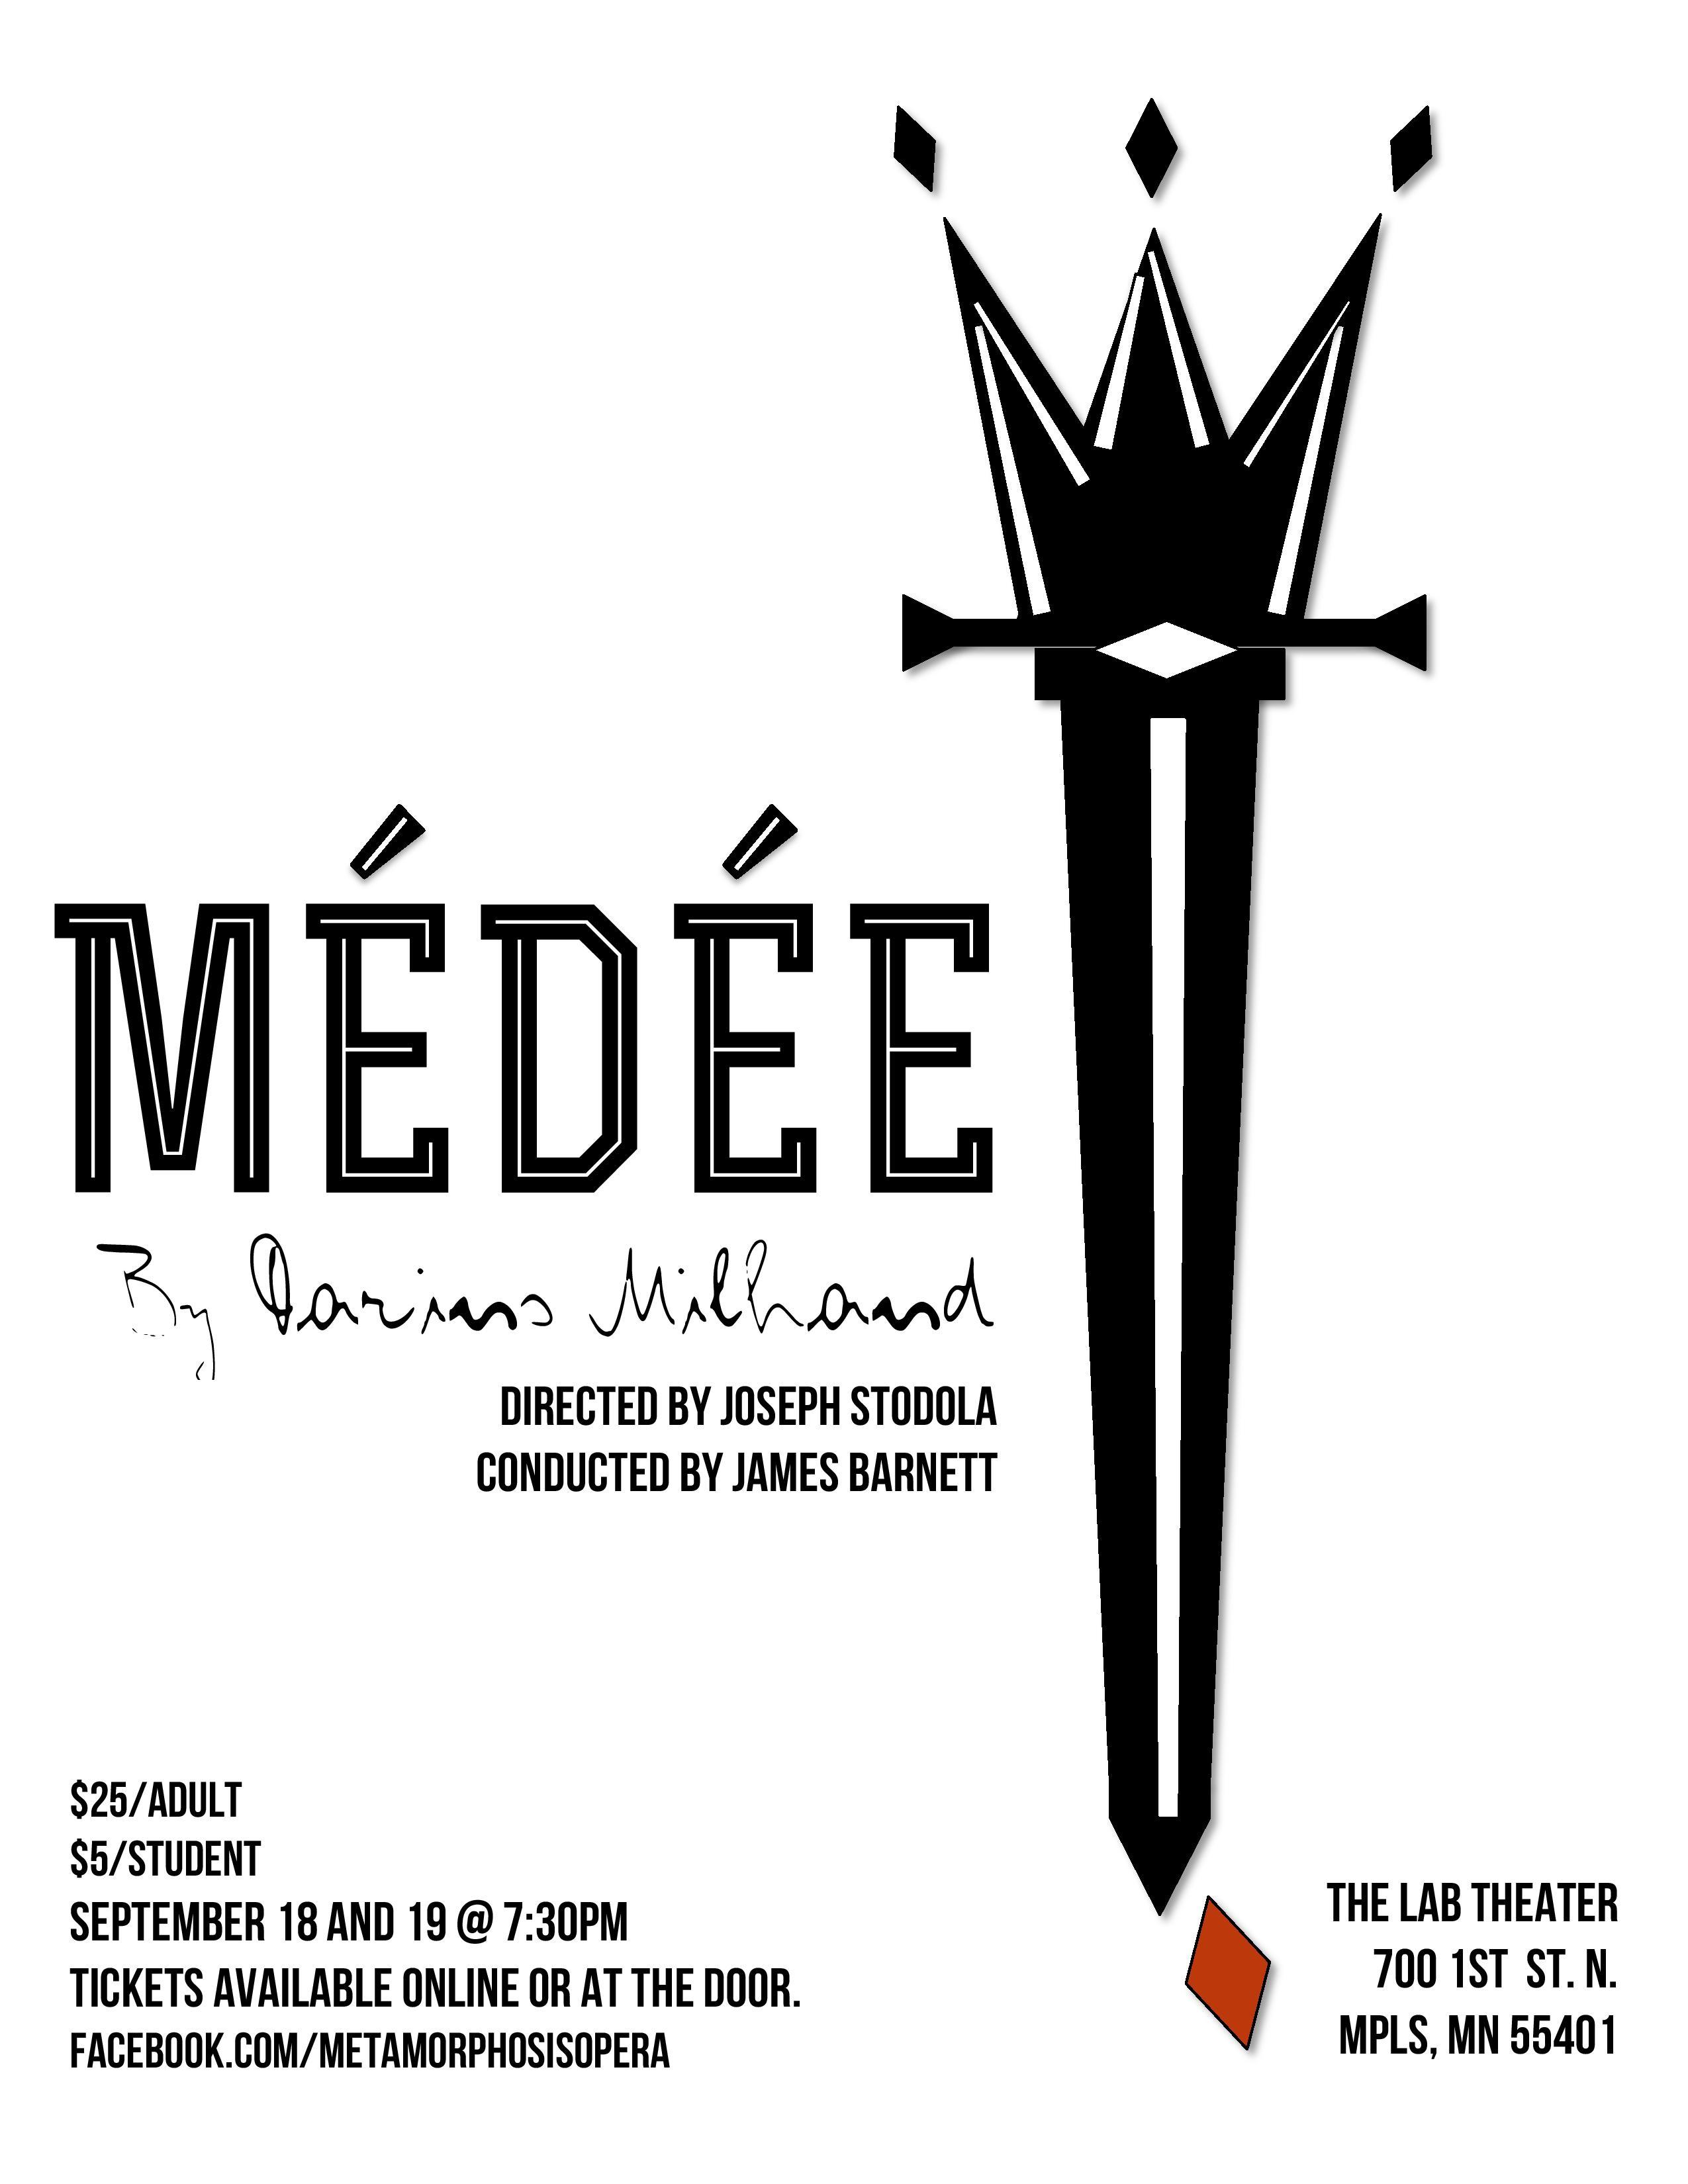 Tickets For Metamorphosis Opera Theater In Minneapolis